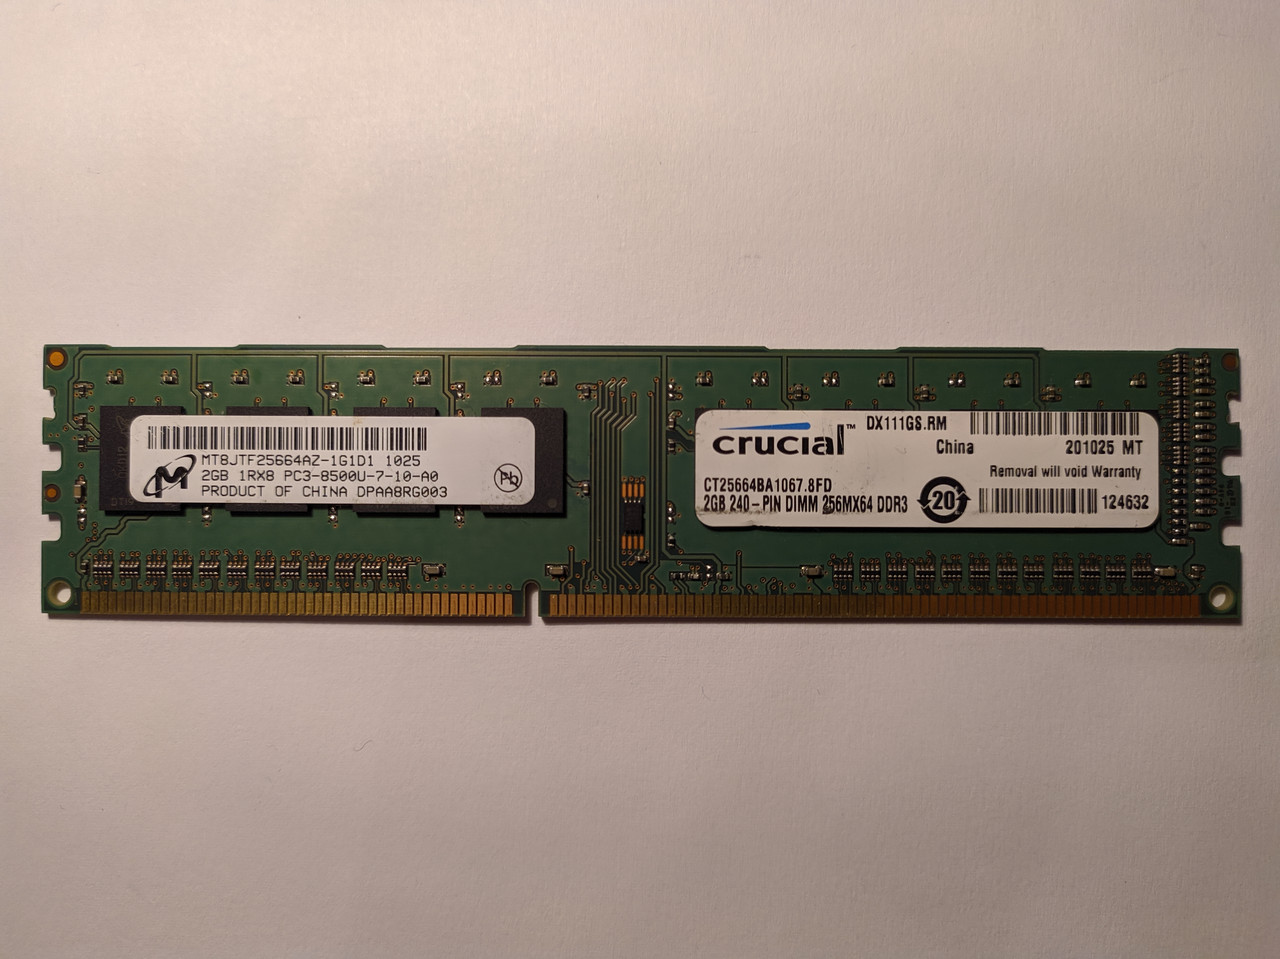 Оперативная память DIMM Micron DDR3 2GB 1Rx8 1066MHz (MT8JTF25664AZ-1G1D1) Б/У